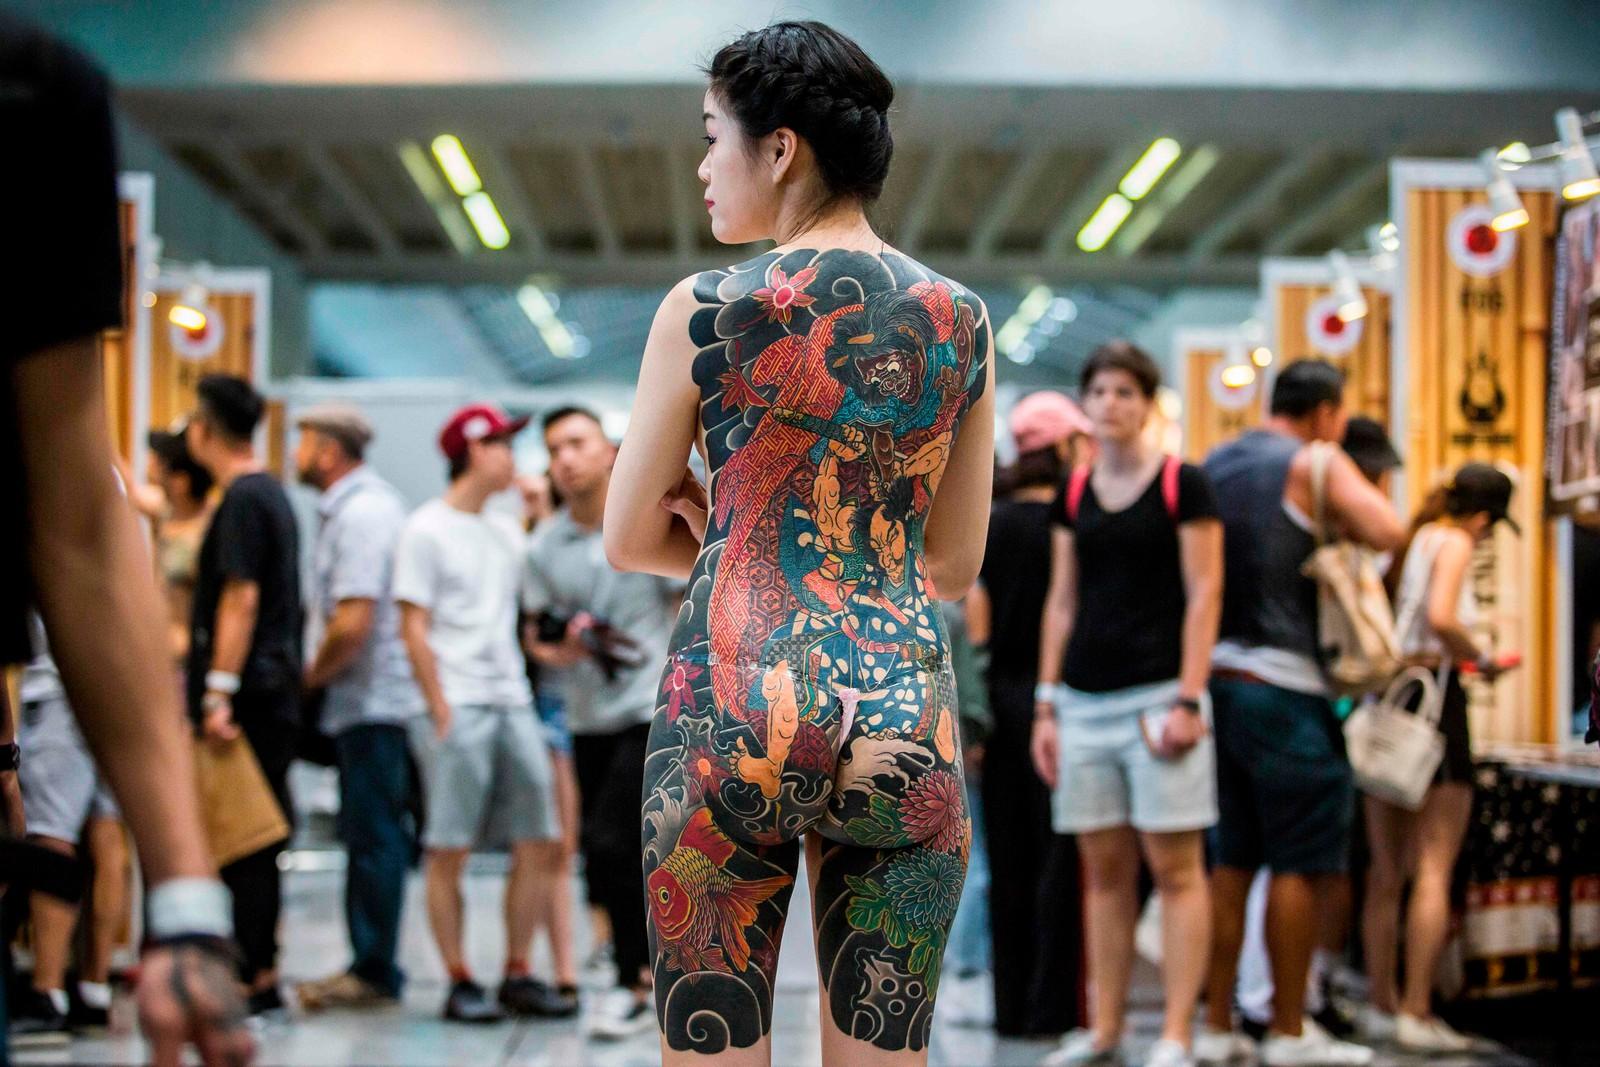 En kvinne viser fram tatoveringene sine for fotografen. Over 300 tatovører var samla til tatoveringsmesse i Hong Kong forrige helg.